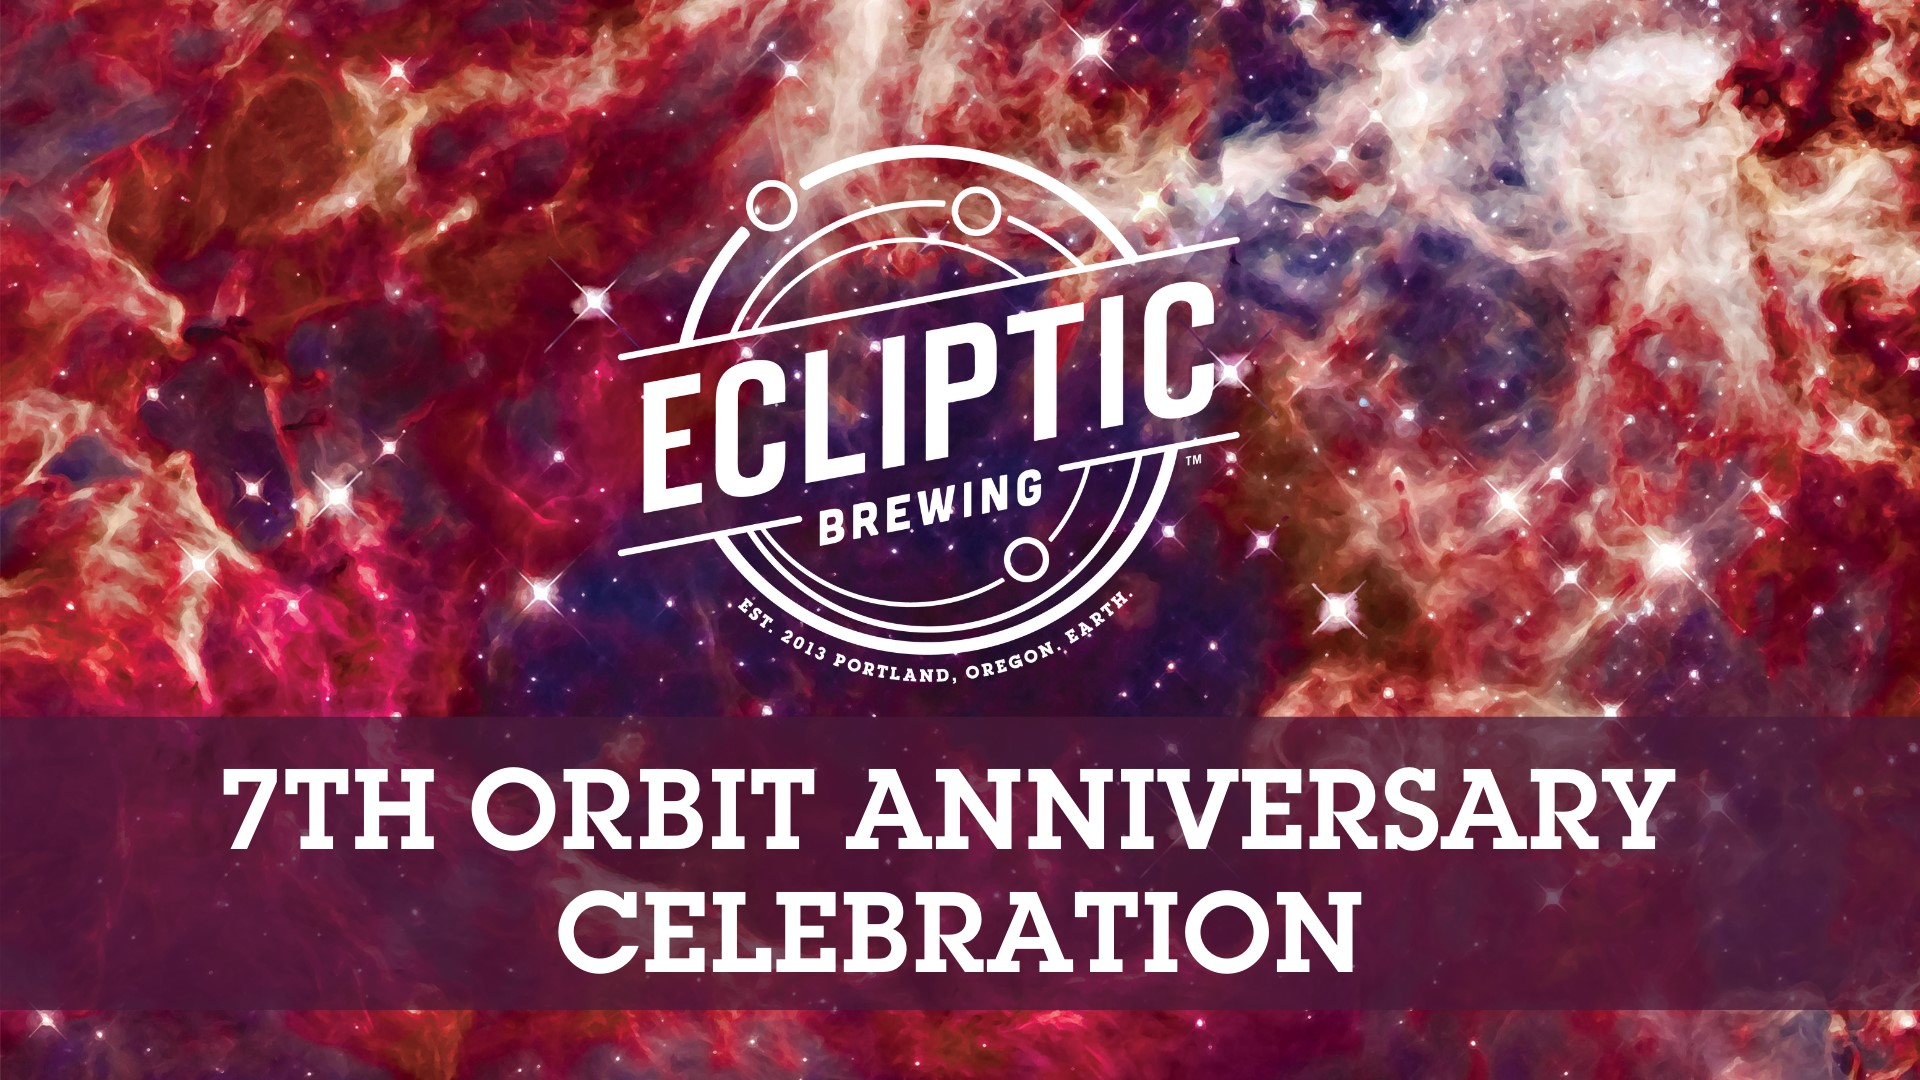 Ecliptic Brewing Seventh Oribt Anniversary Celebration